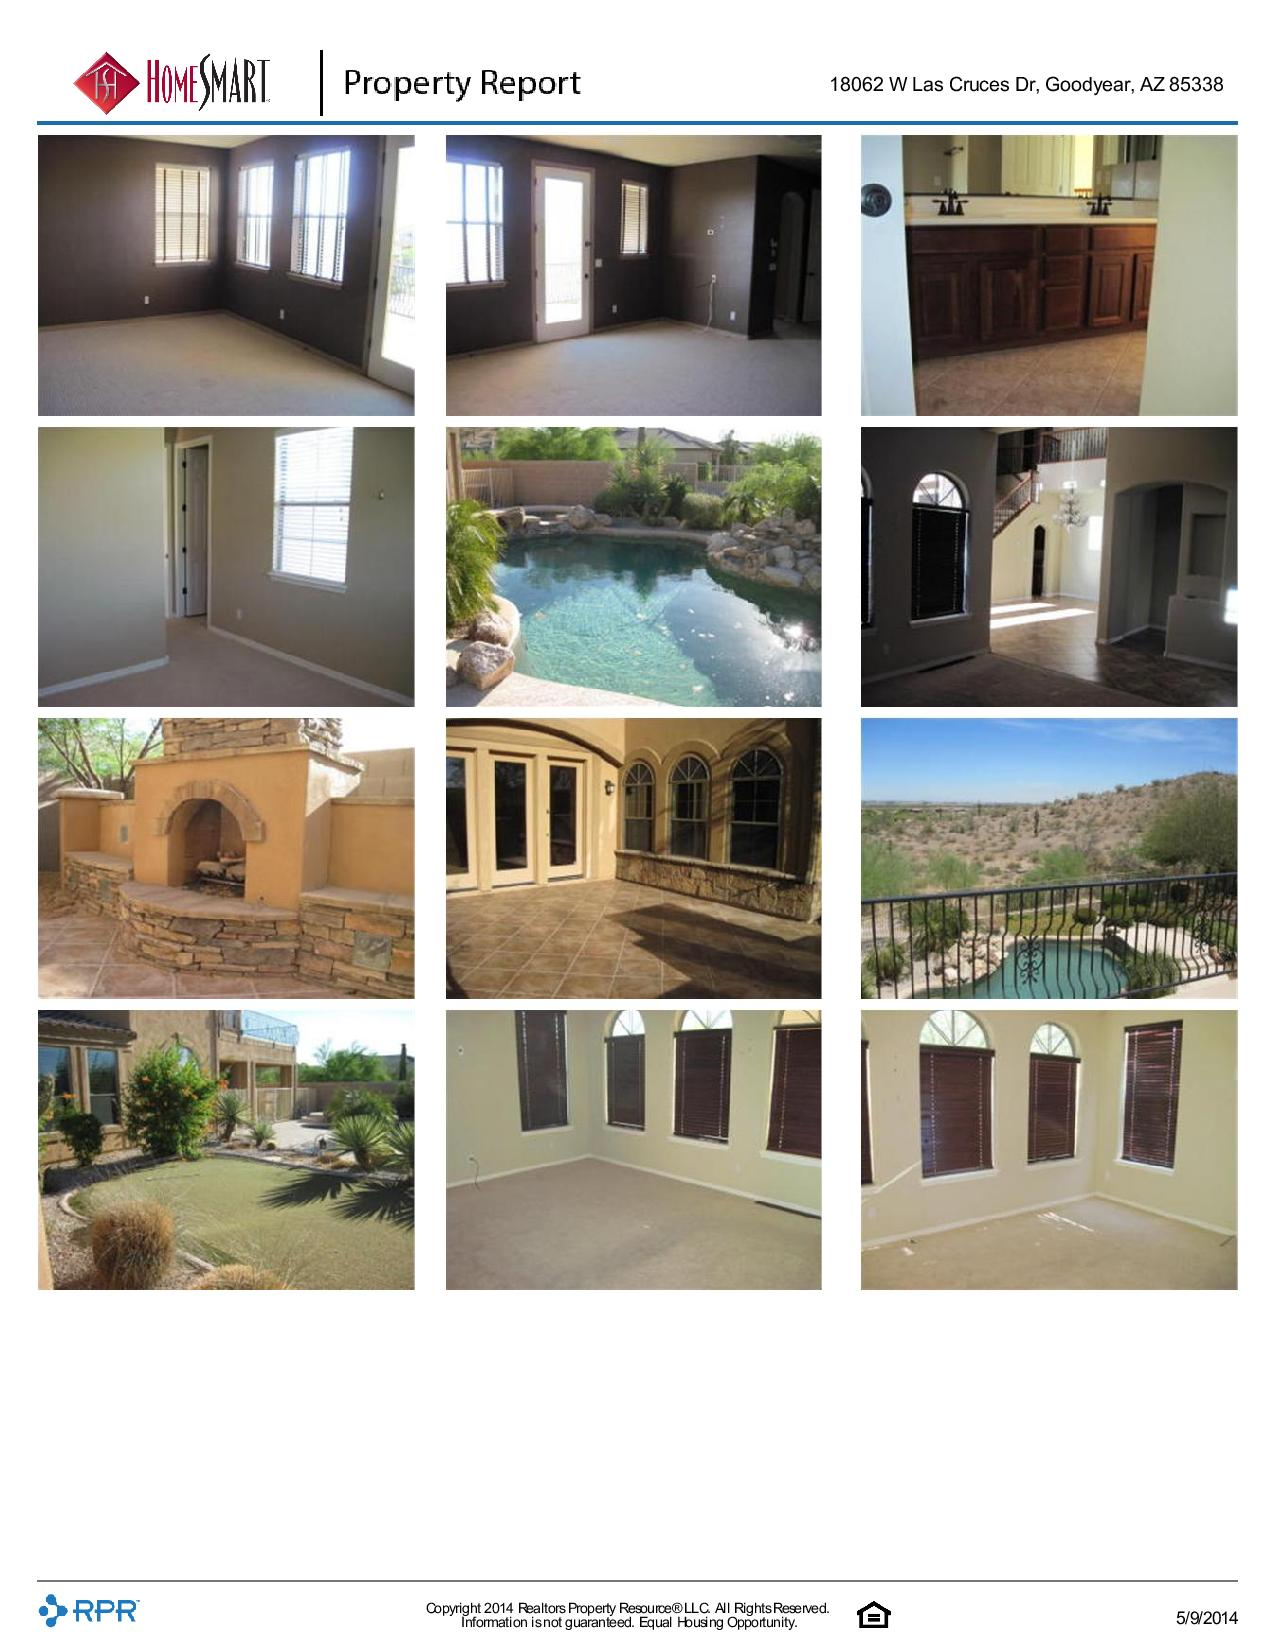 18062-W-Las-Cruces-Dr-Goodyear-AZ-85338-page-005